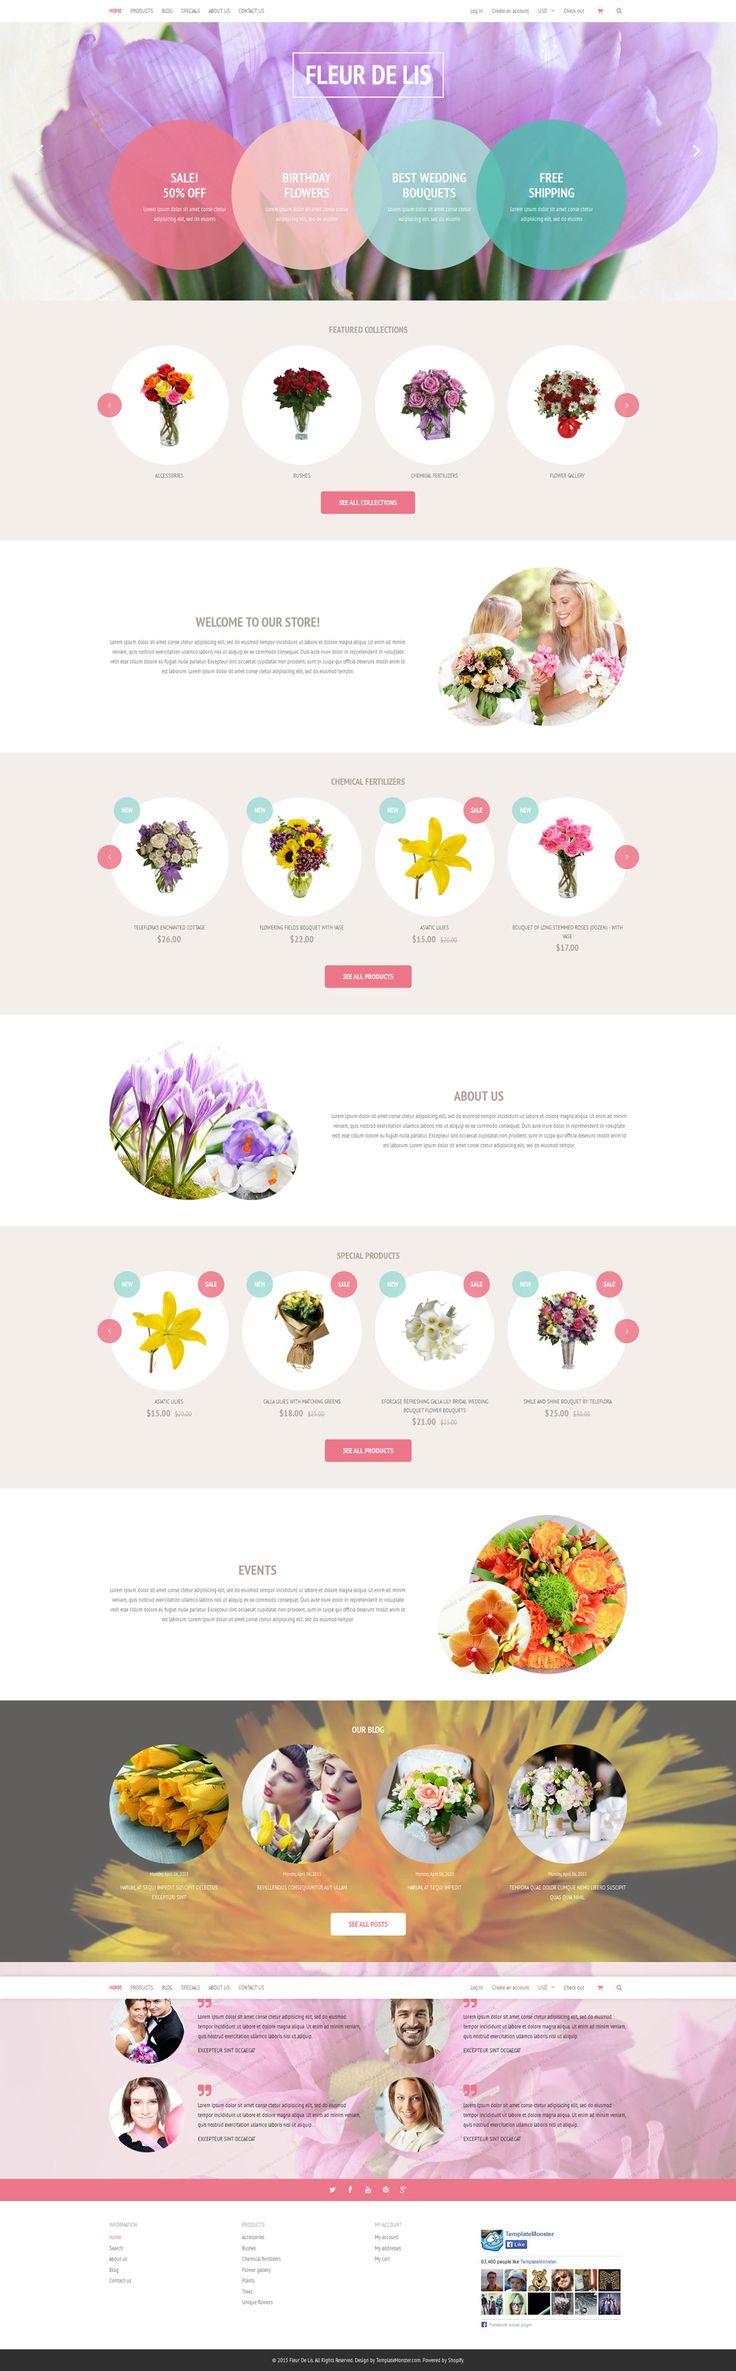 Flower Store Shopify Theme #wedding #gifts http://www.templatemonster.com/free-shopify-theme-flower-shop.html?utm_source=pinterest&utm_medium=timeline&utm_campaign=freefleur